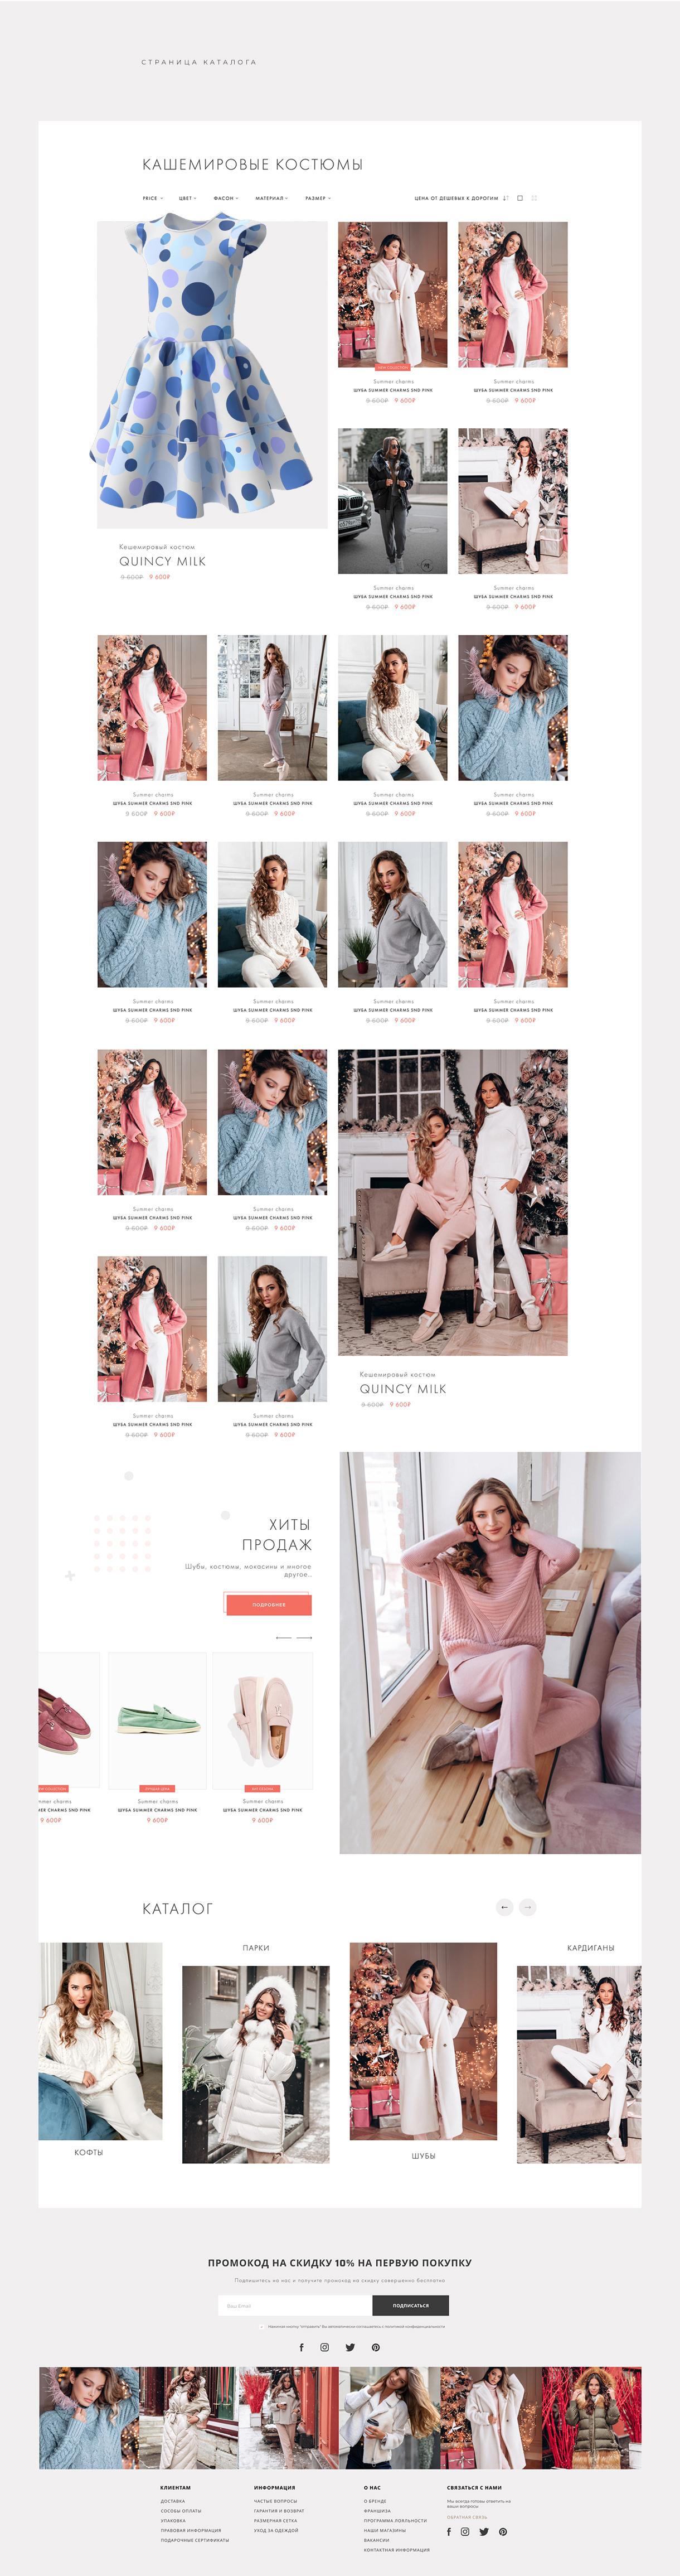 MODDE - редизайн интернет магазина одежды